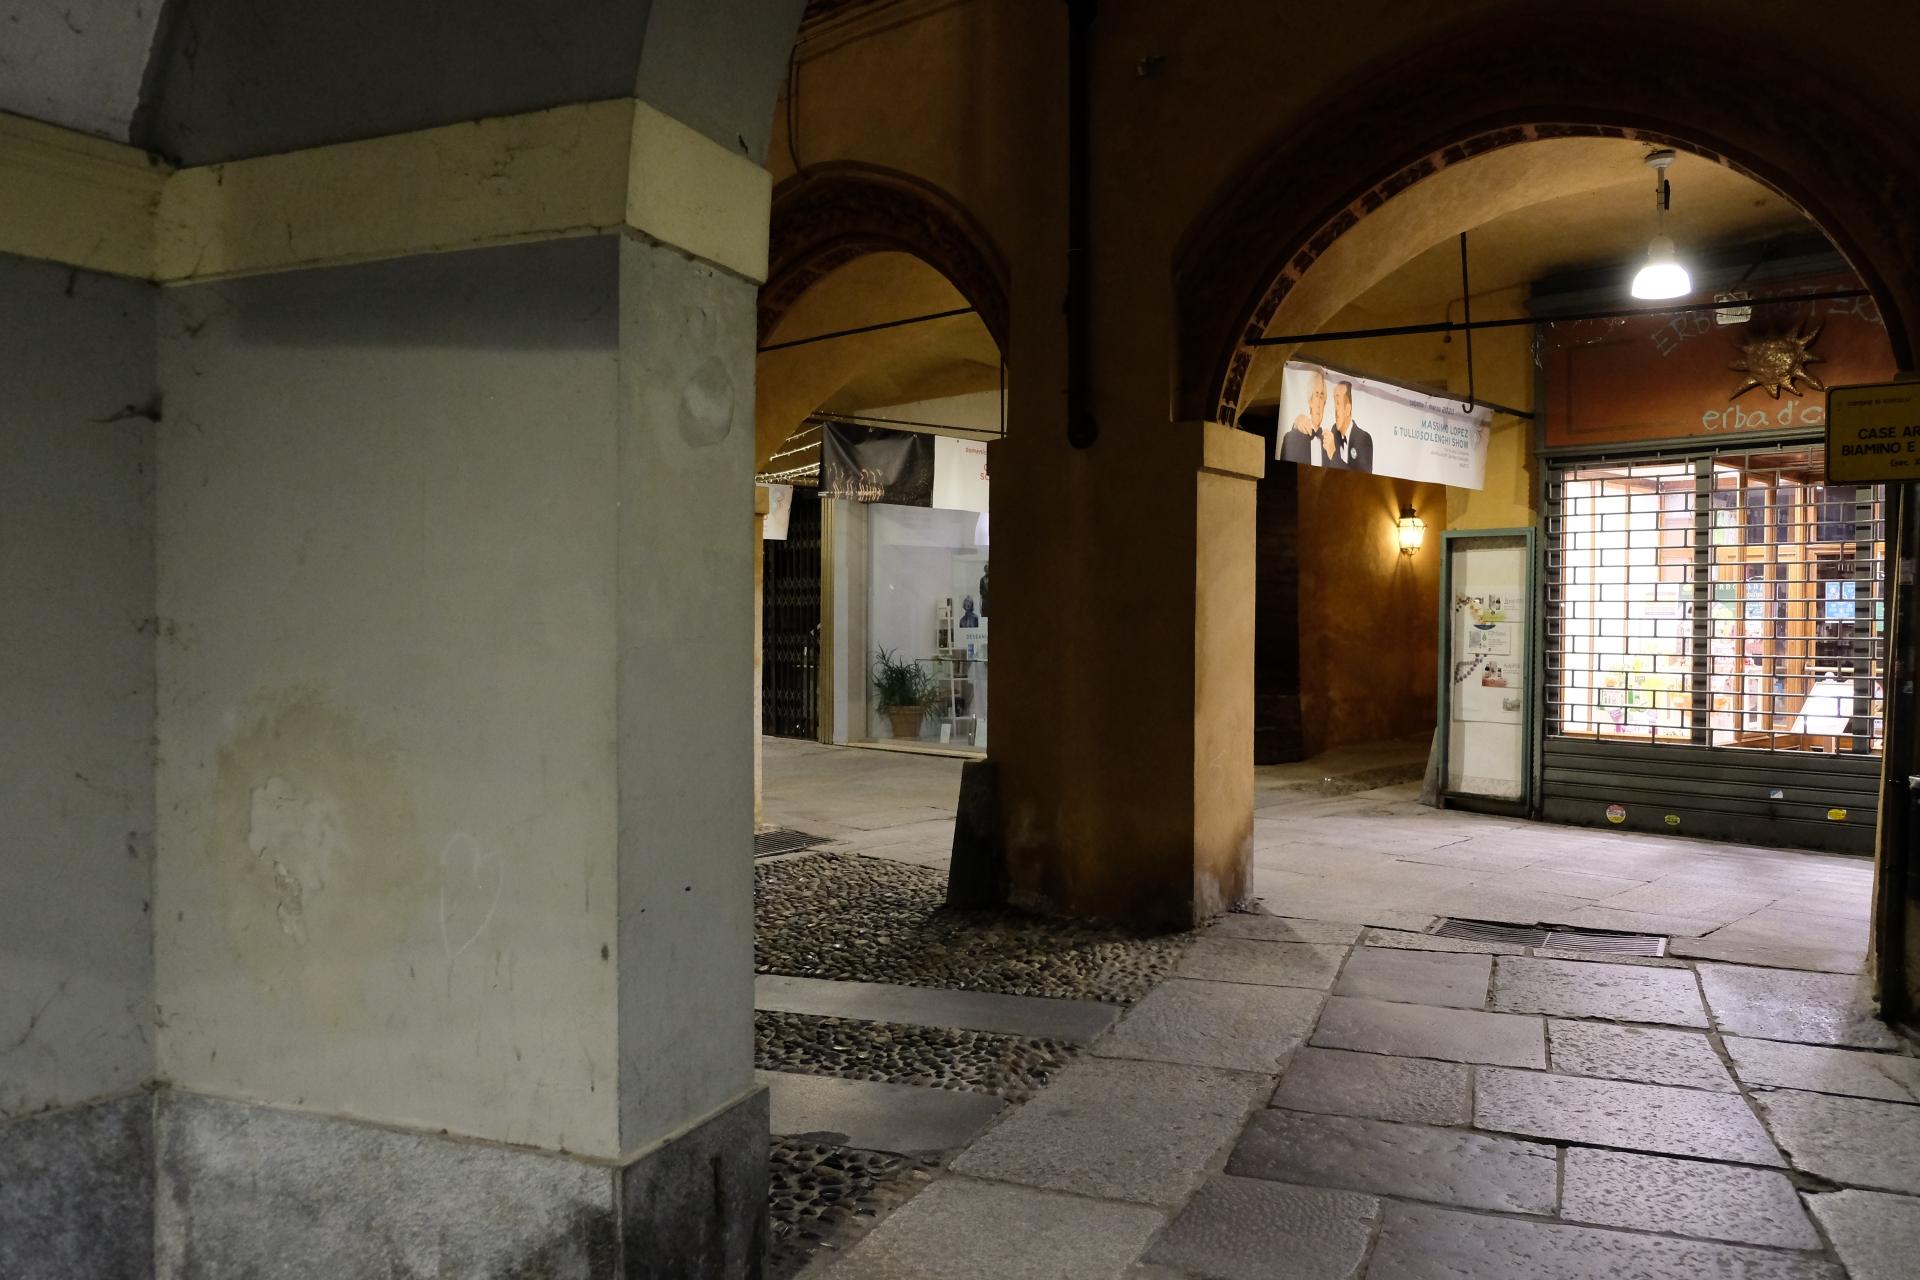 Portici piazza Cavour